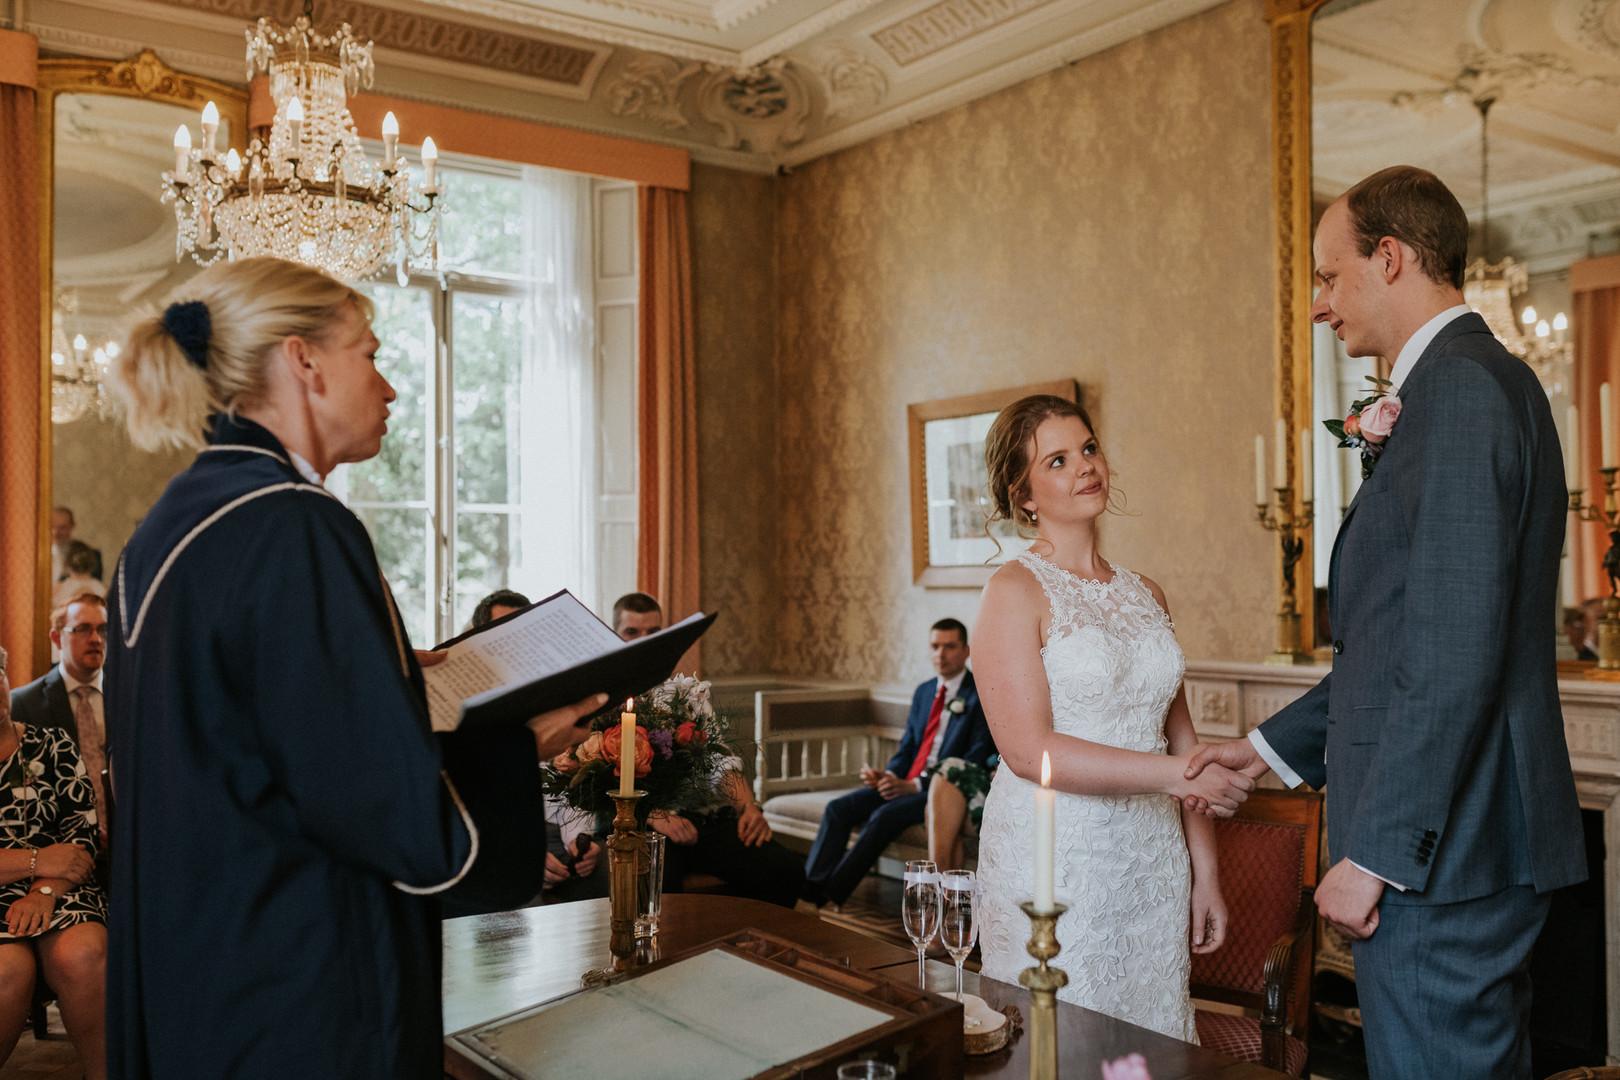 bruiloft-eindhoven-april-zomer-kasteelhoeve-140.jpg